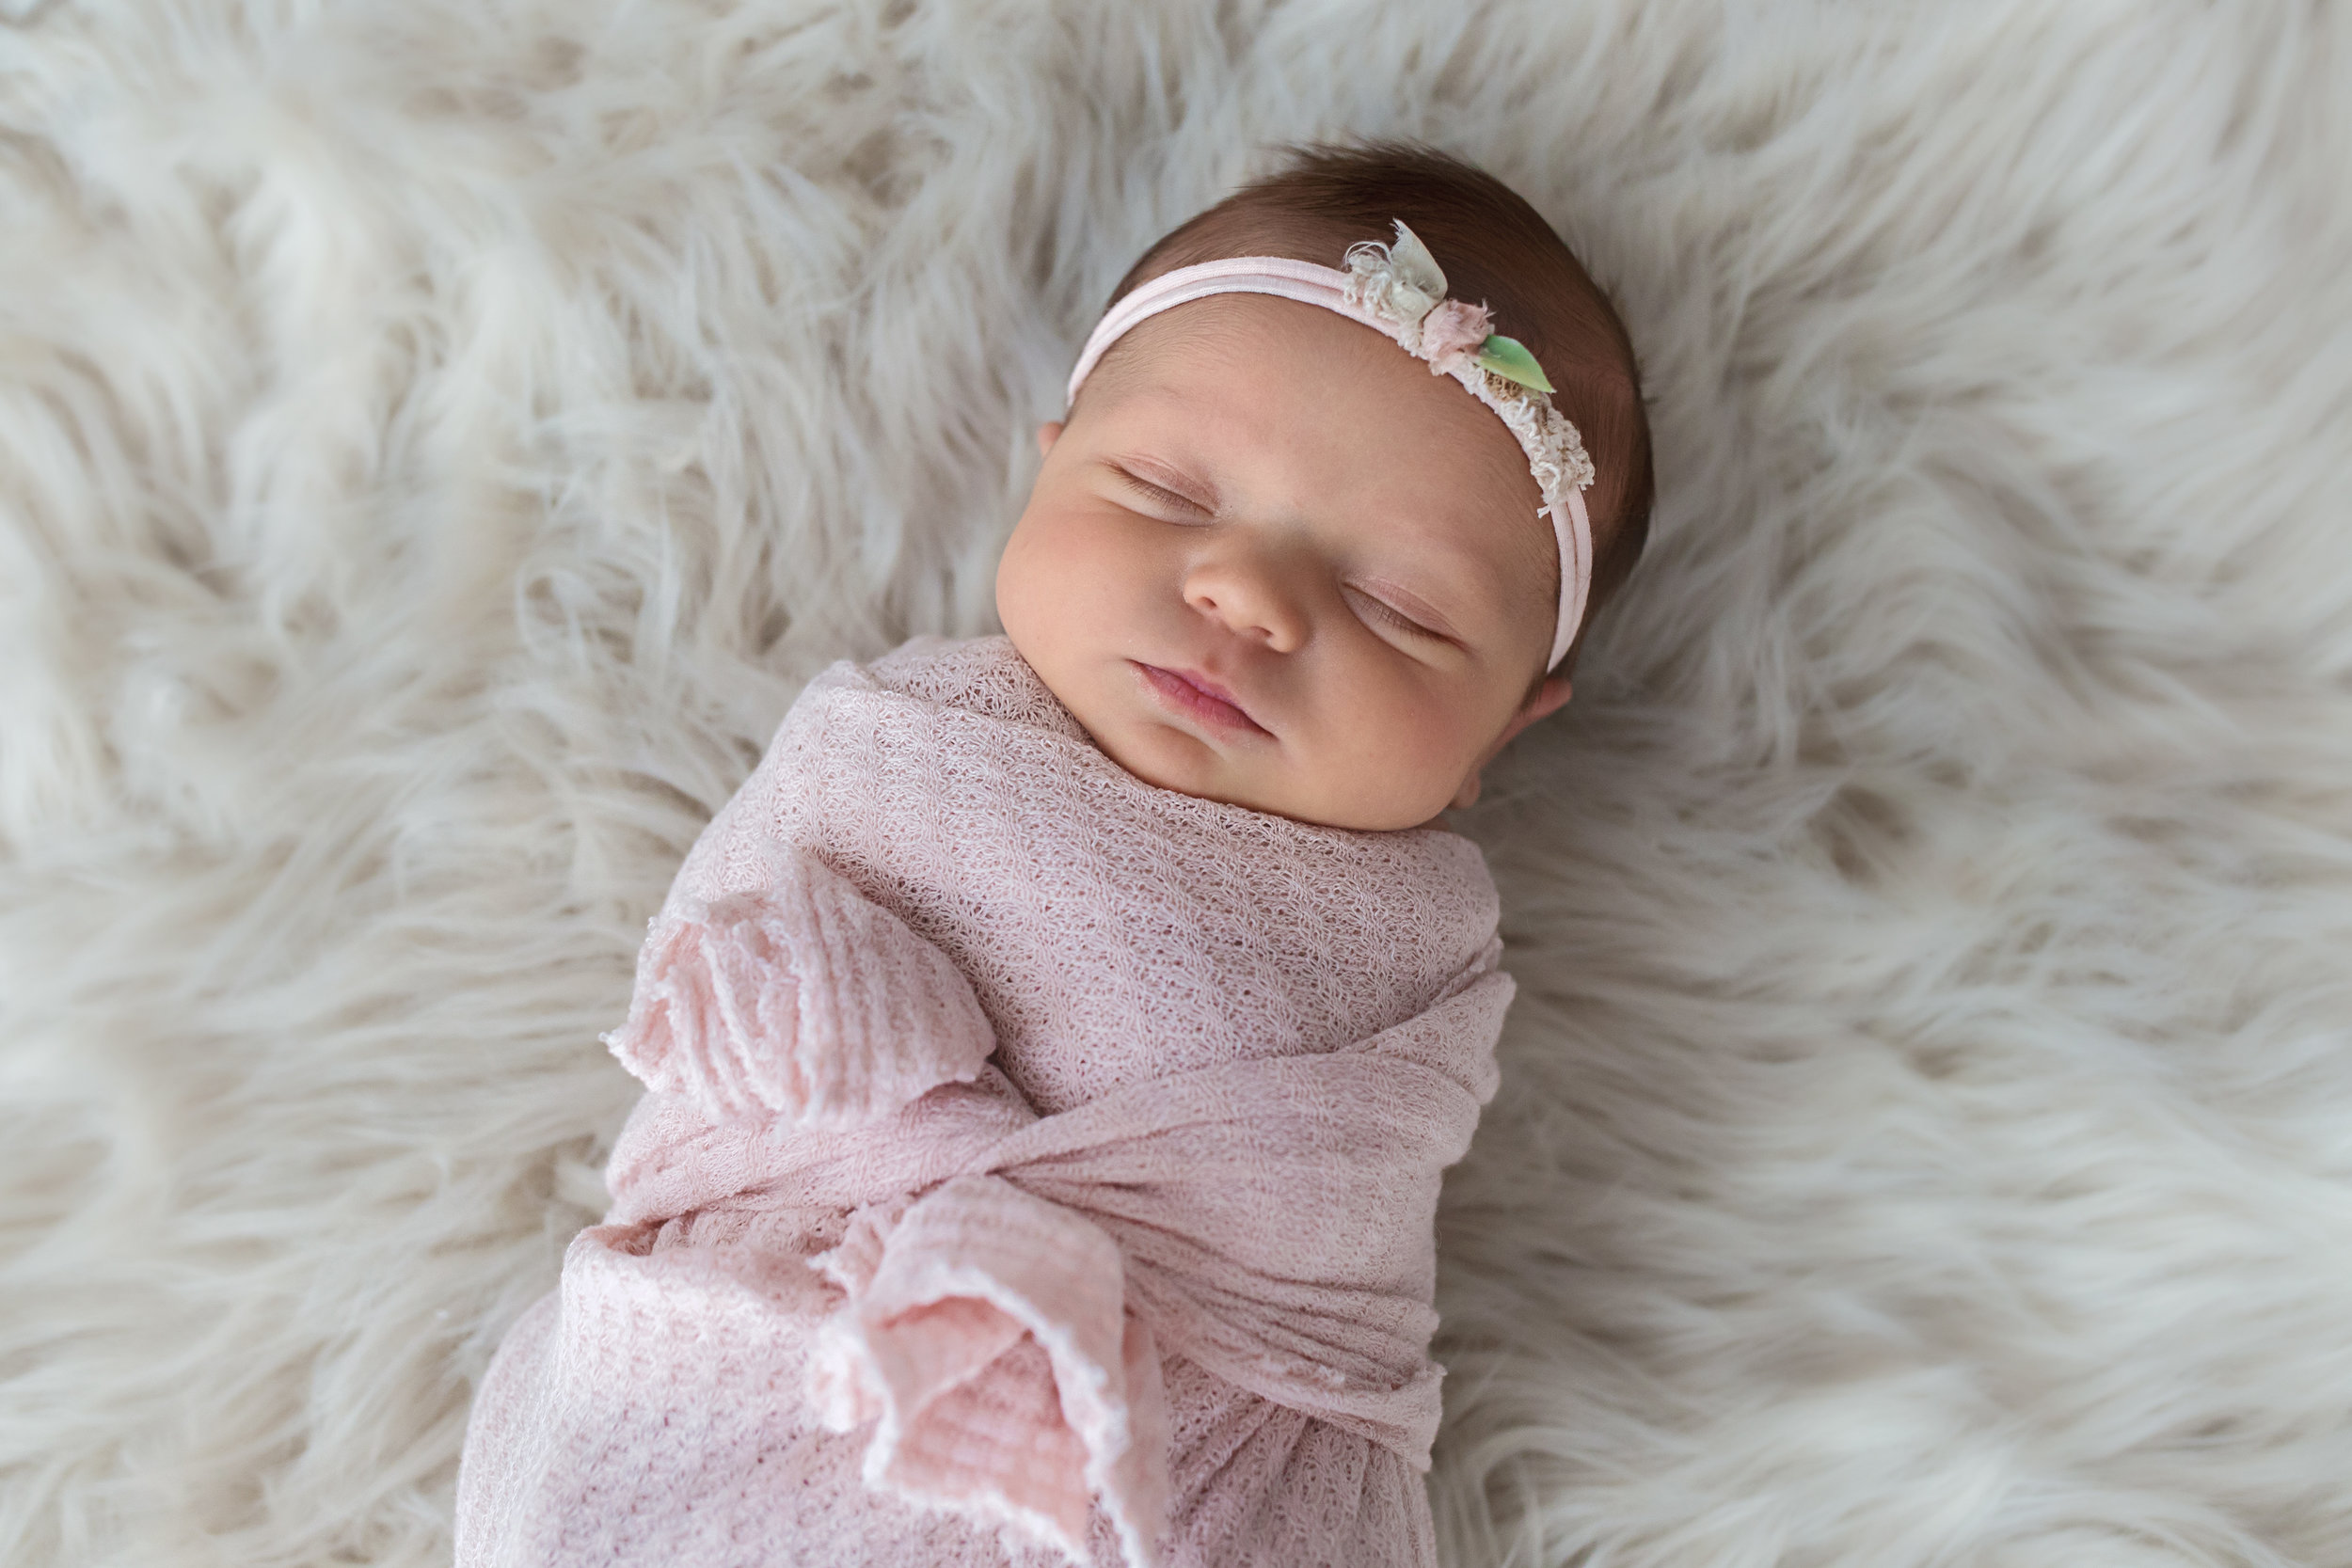 BabyMaura5.jpg